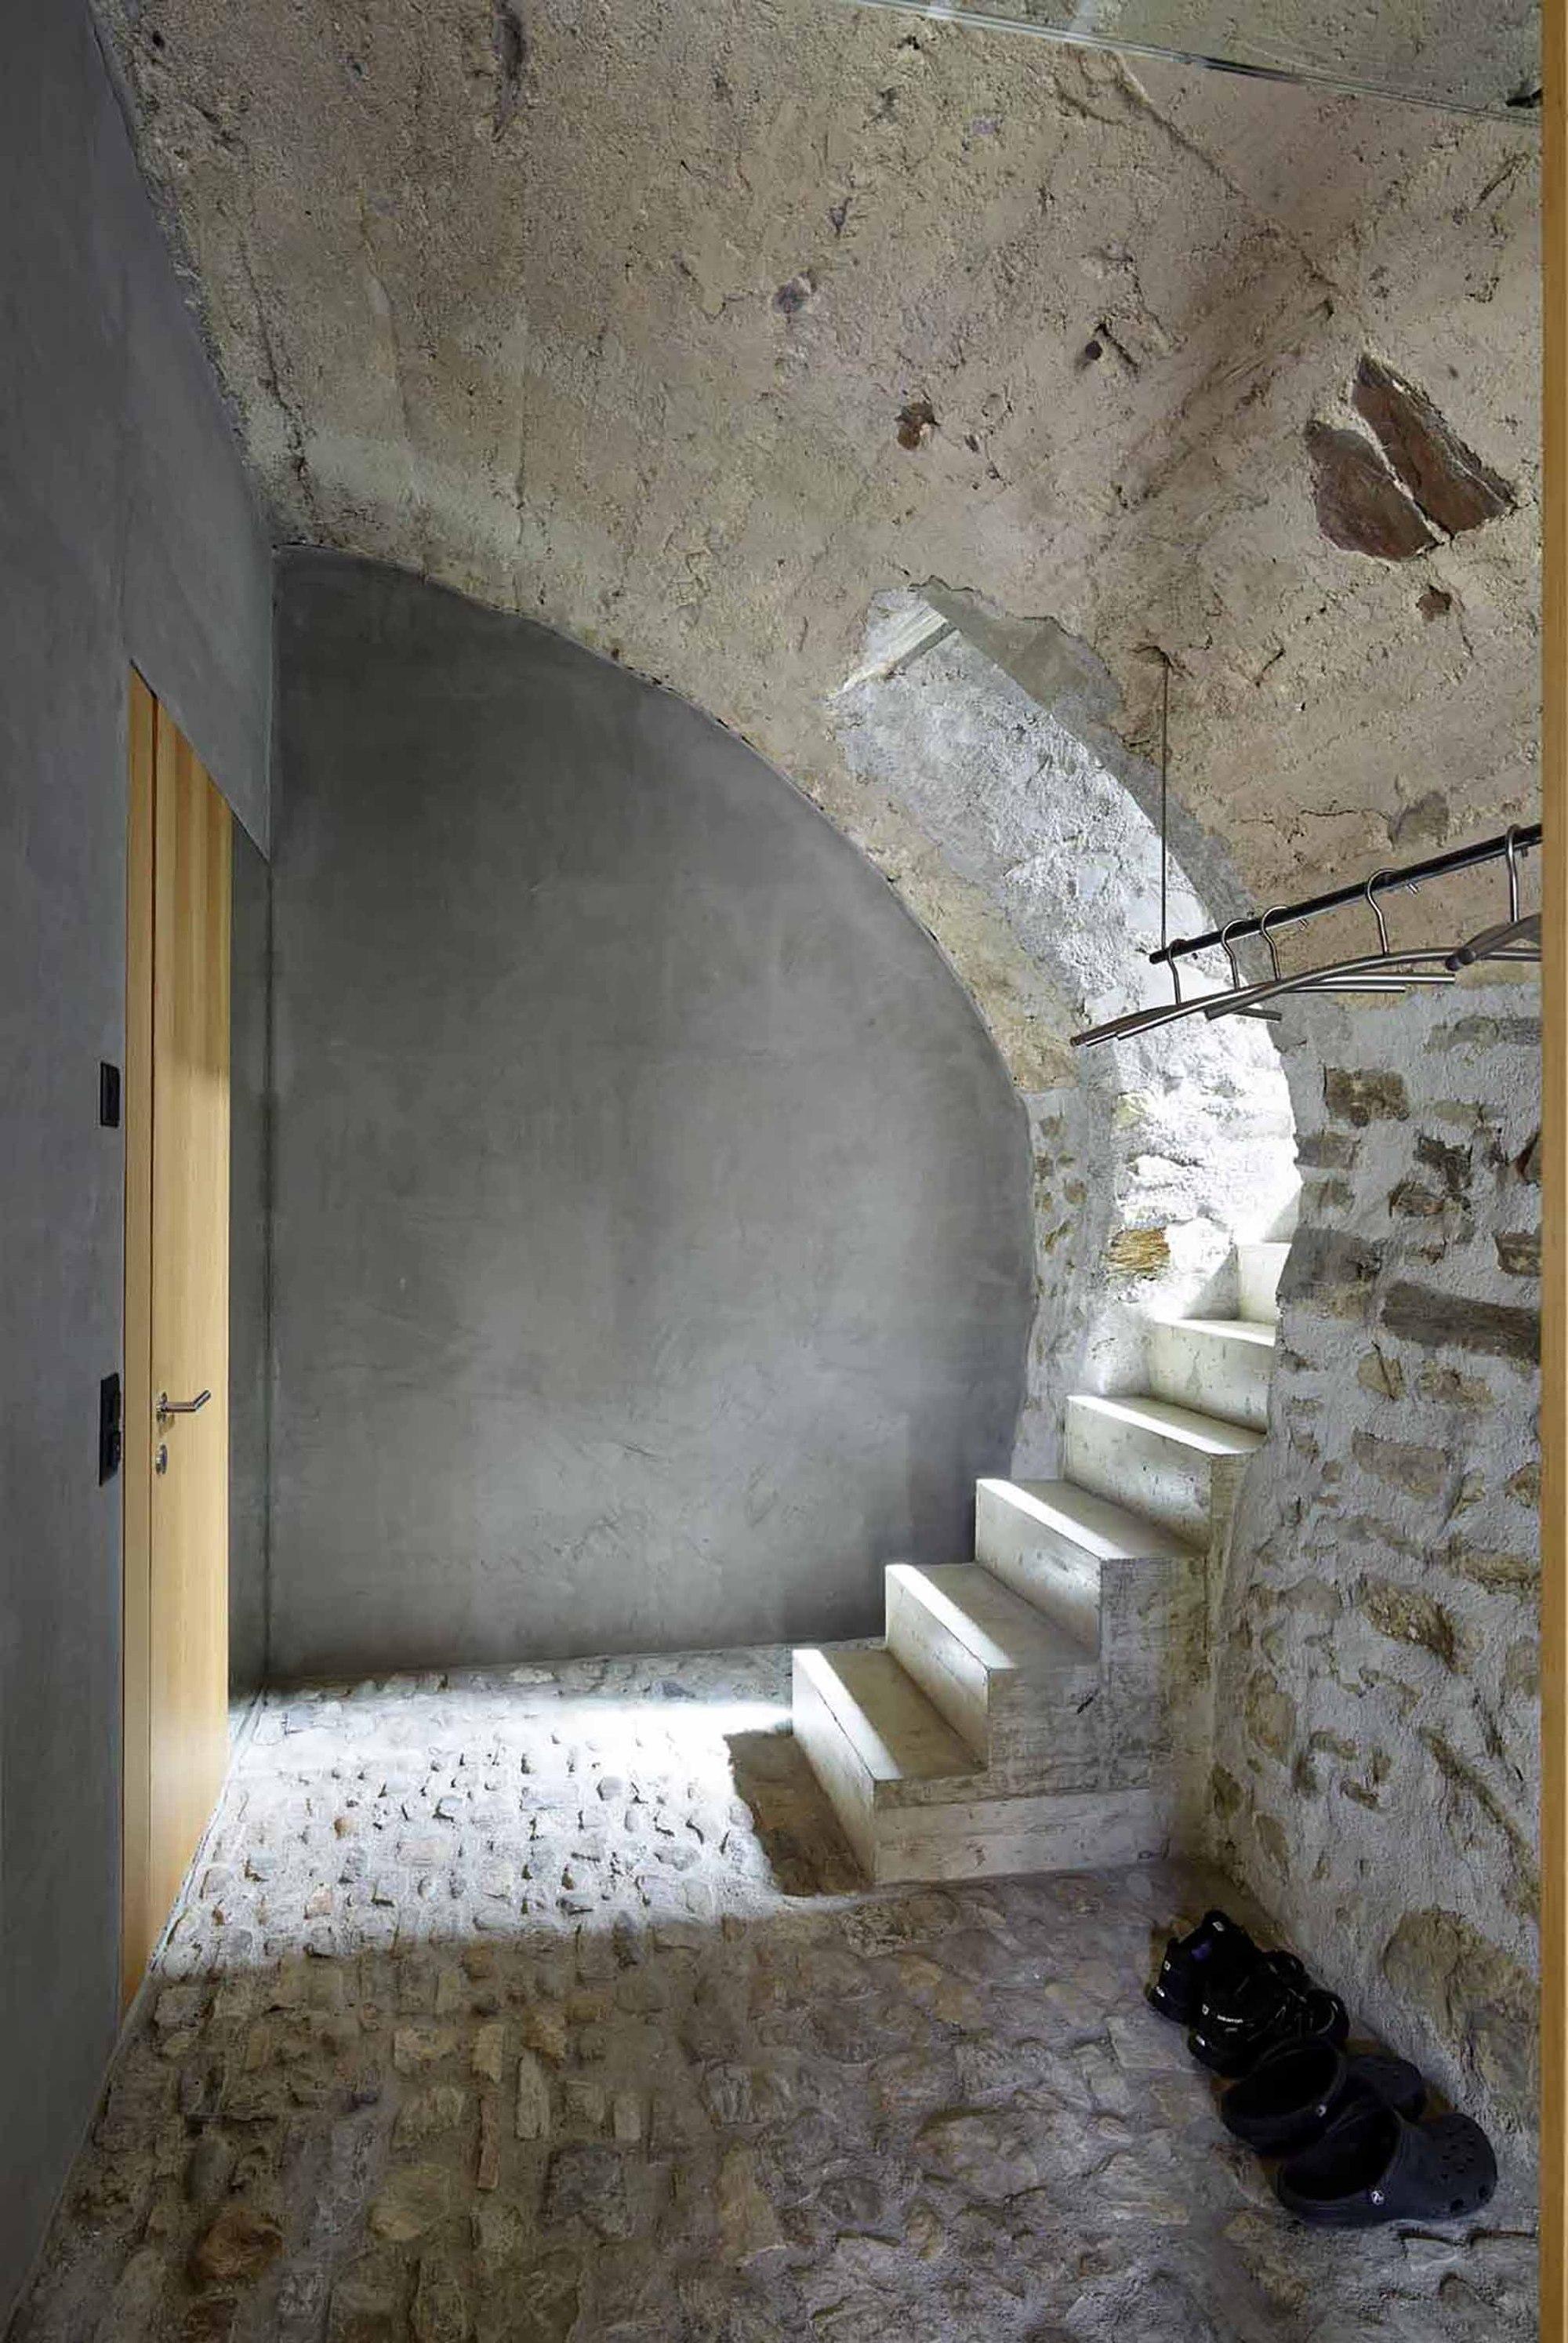 543dd679c07a80762d000254_stone-house-transformation-in-scaiano-wespi-de-meuron-romeo-architects_1430_cf031653.jpg